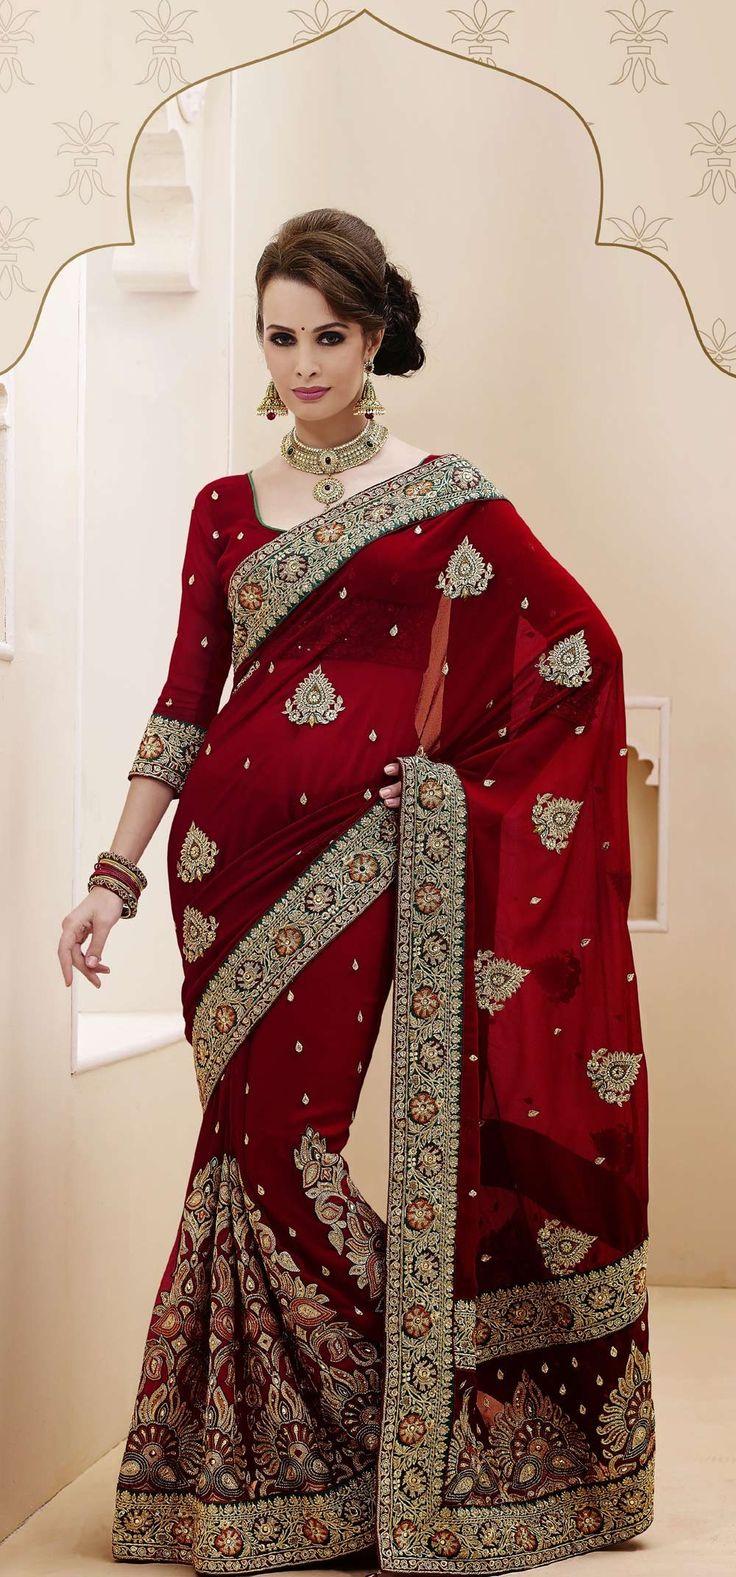 Indian Wedding Saree Latest Designs Amp Trends 2018 2019